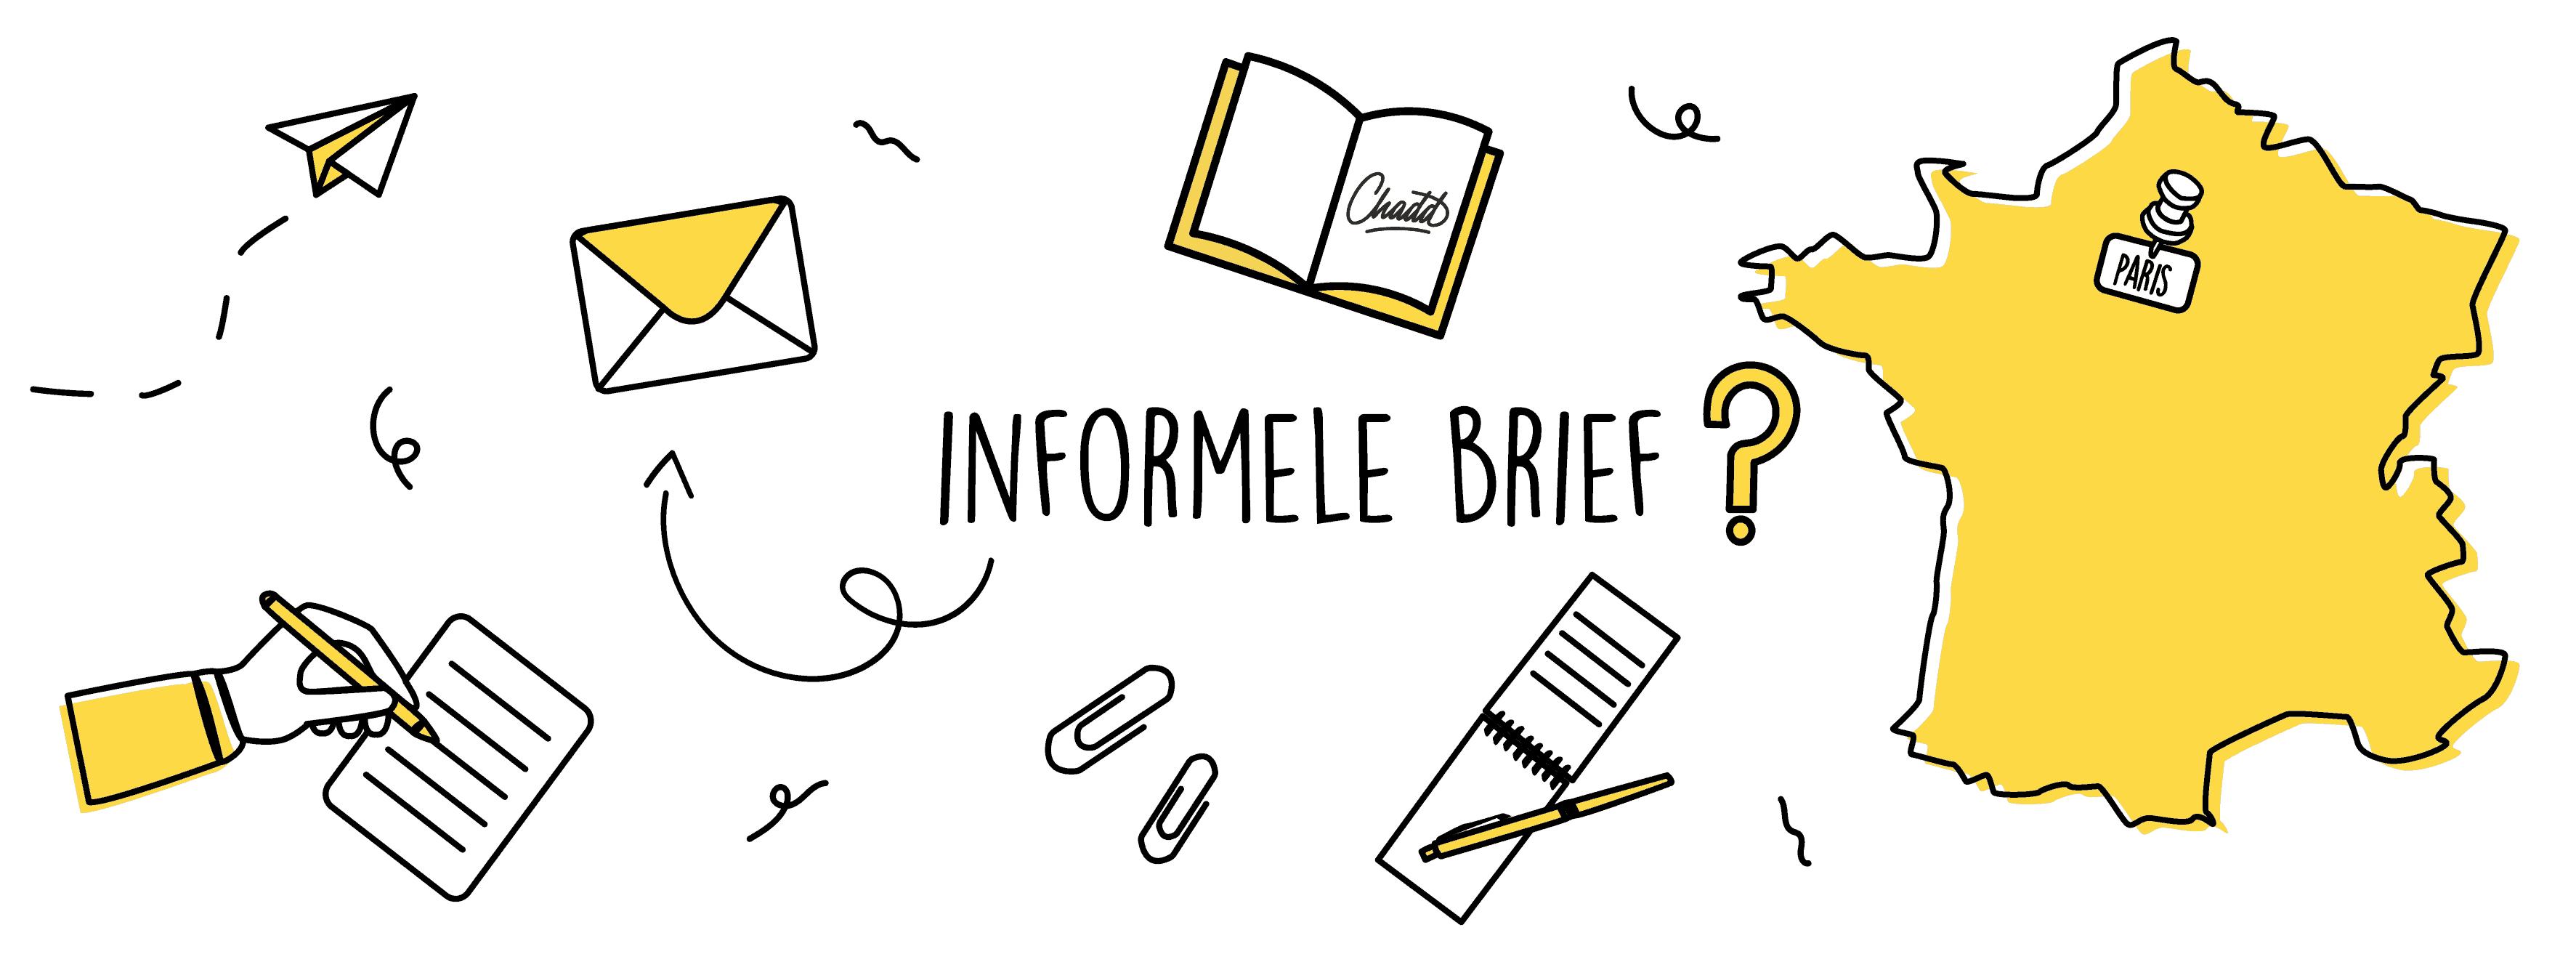 Informele brief in het Frans